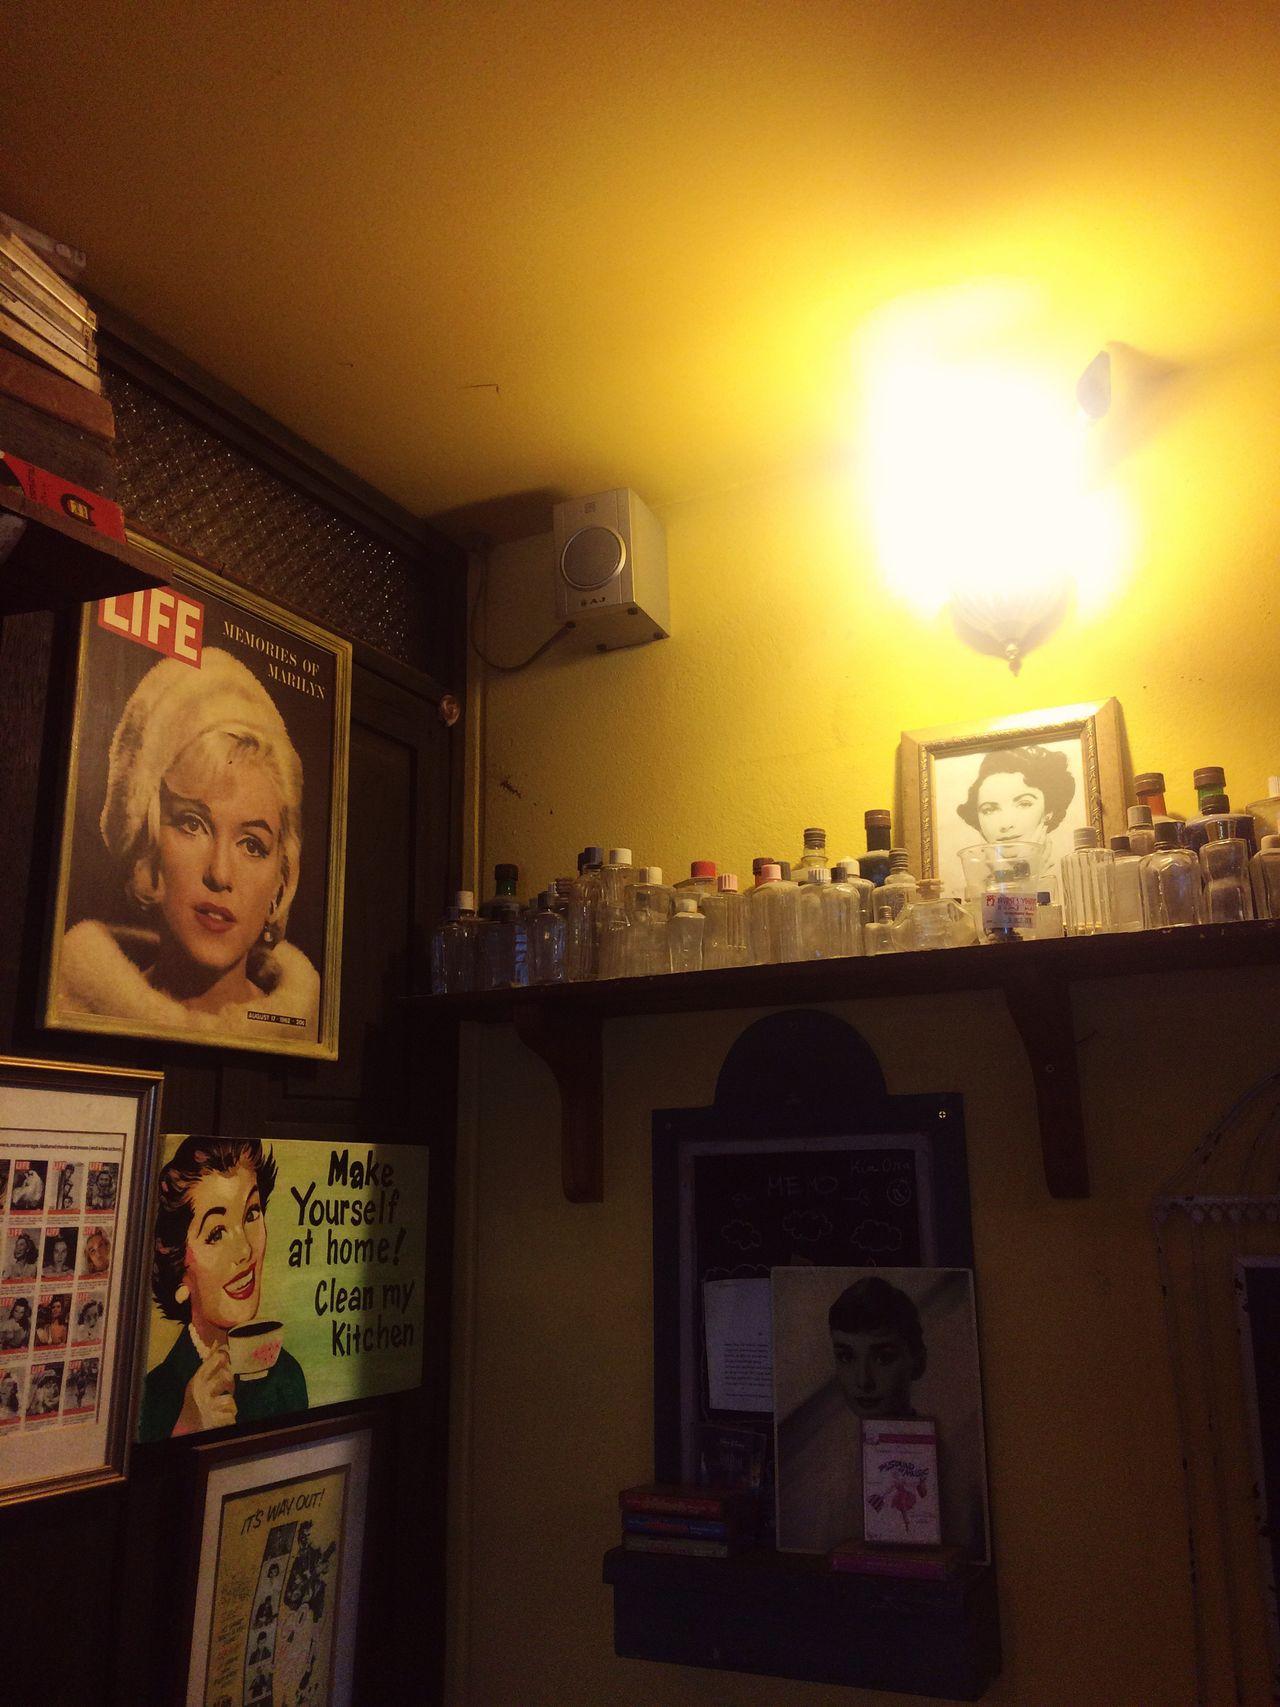 Human Representation Male Likeness Indoors  Female Likeness No People Day Jack O Lantern Vintage Style Home Interior